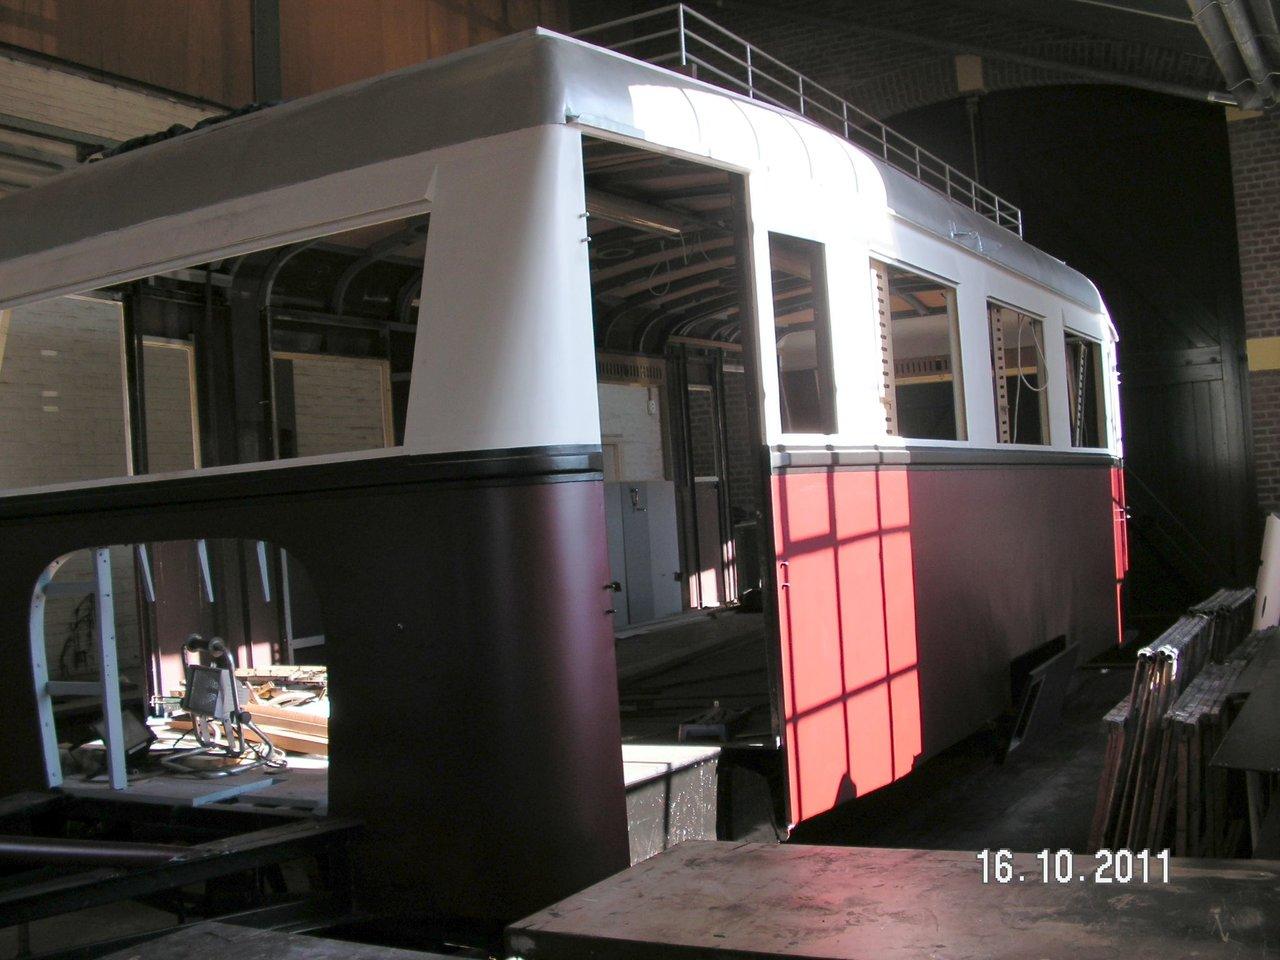 Diorama Bahnhof Asendorf mit T41 in H0e / 1/87 Schmalspur 38110015qn